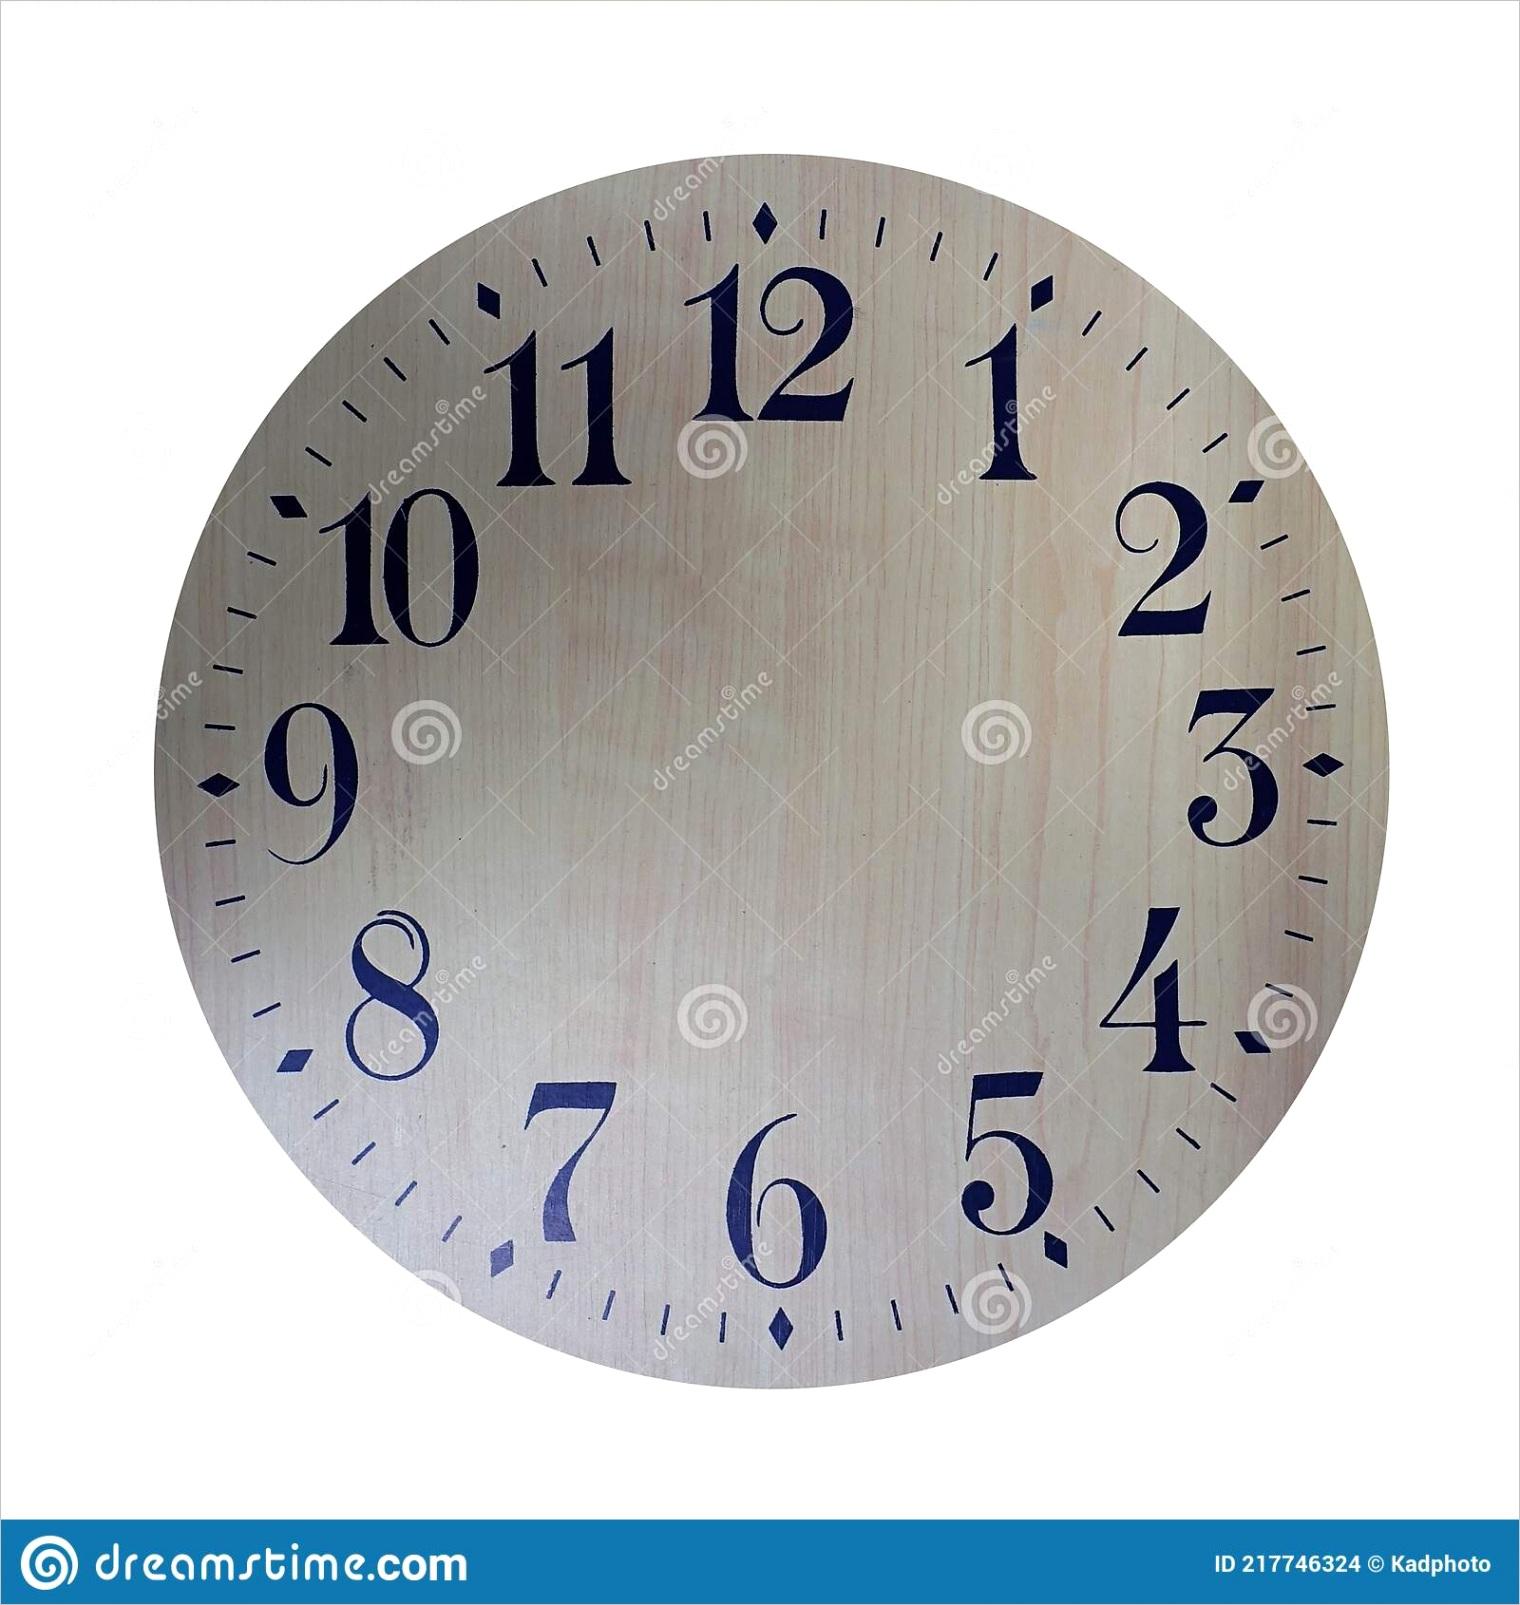 blank clock faceml